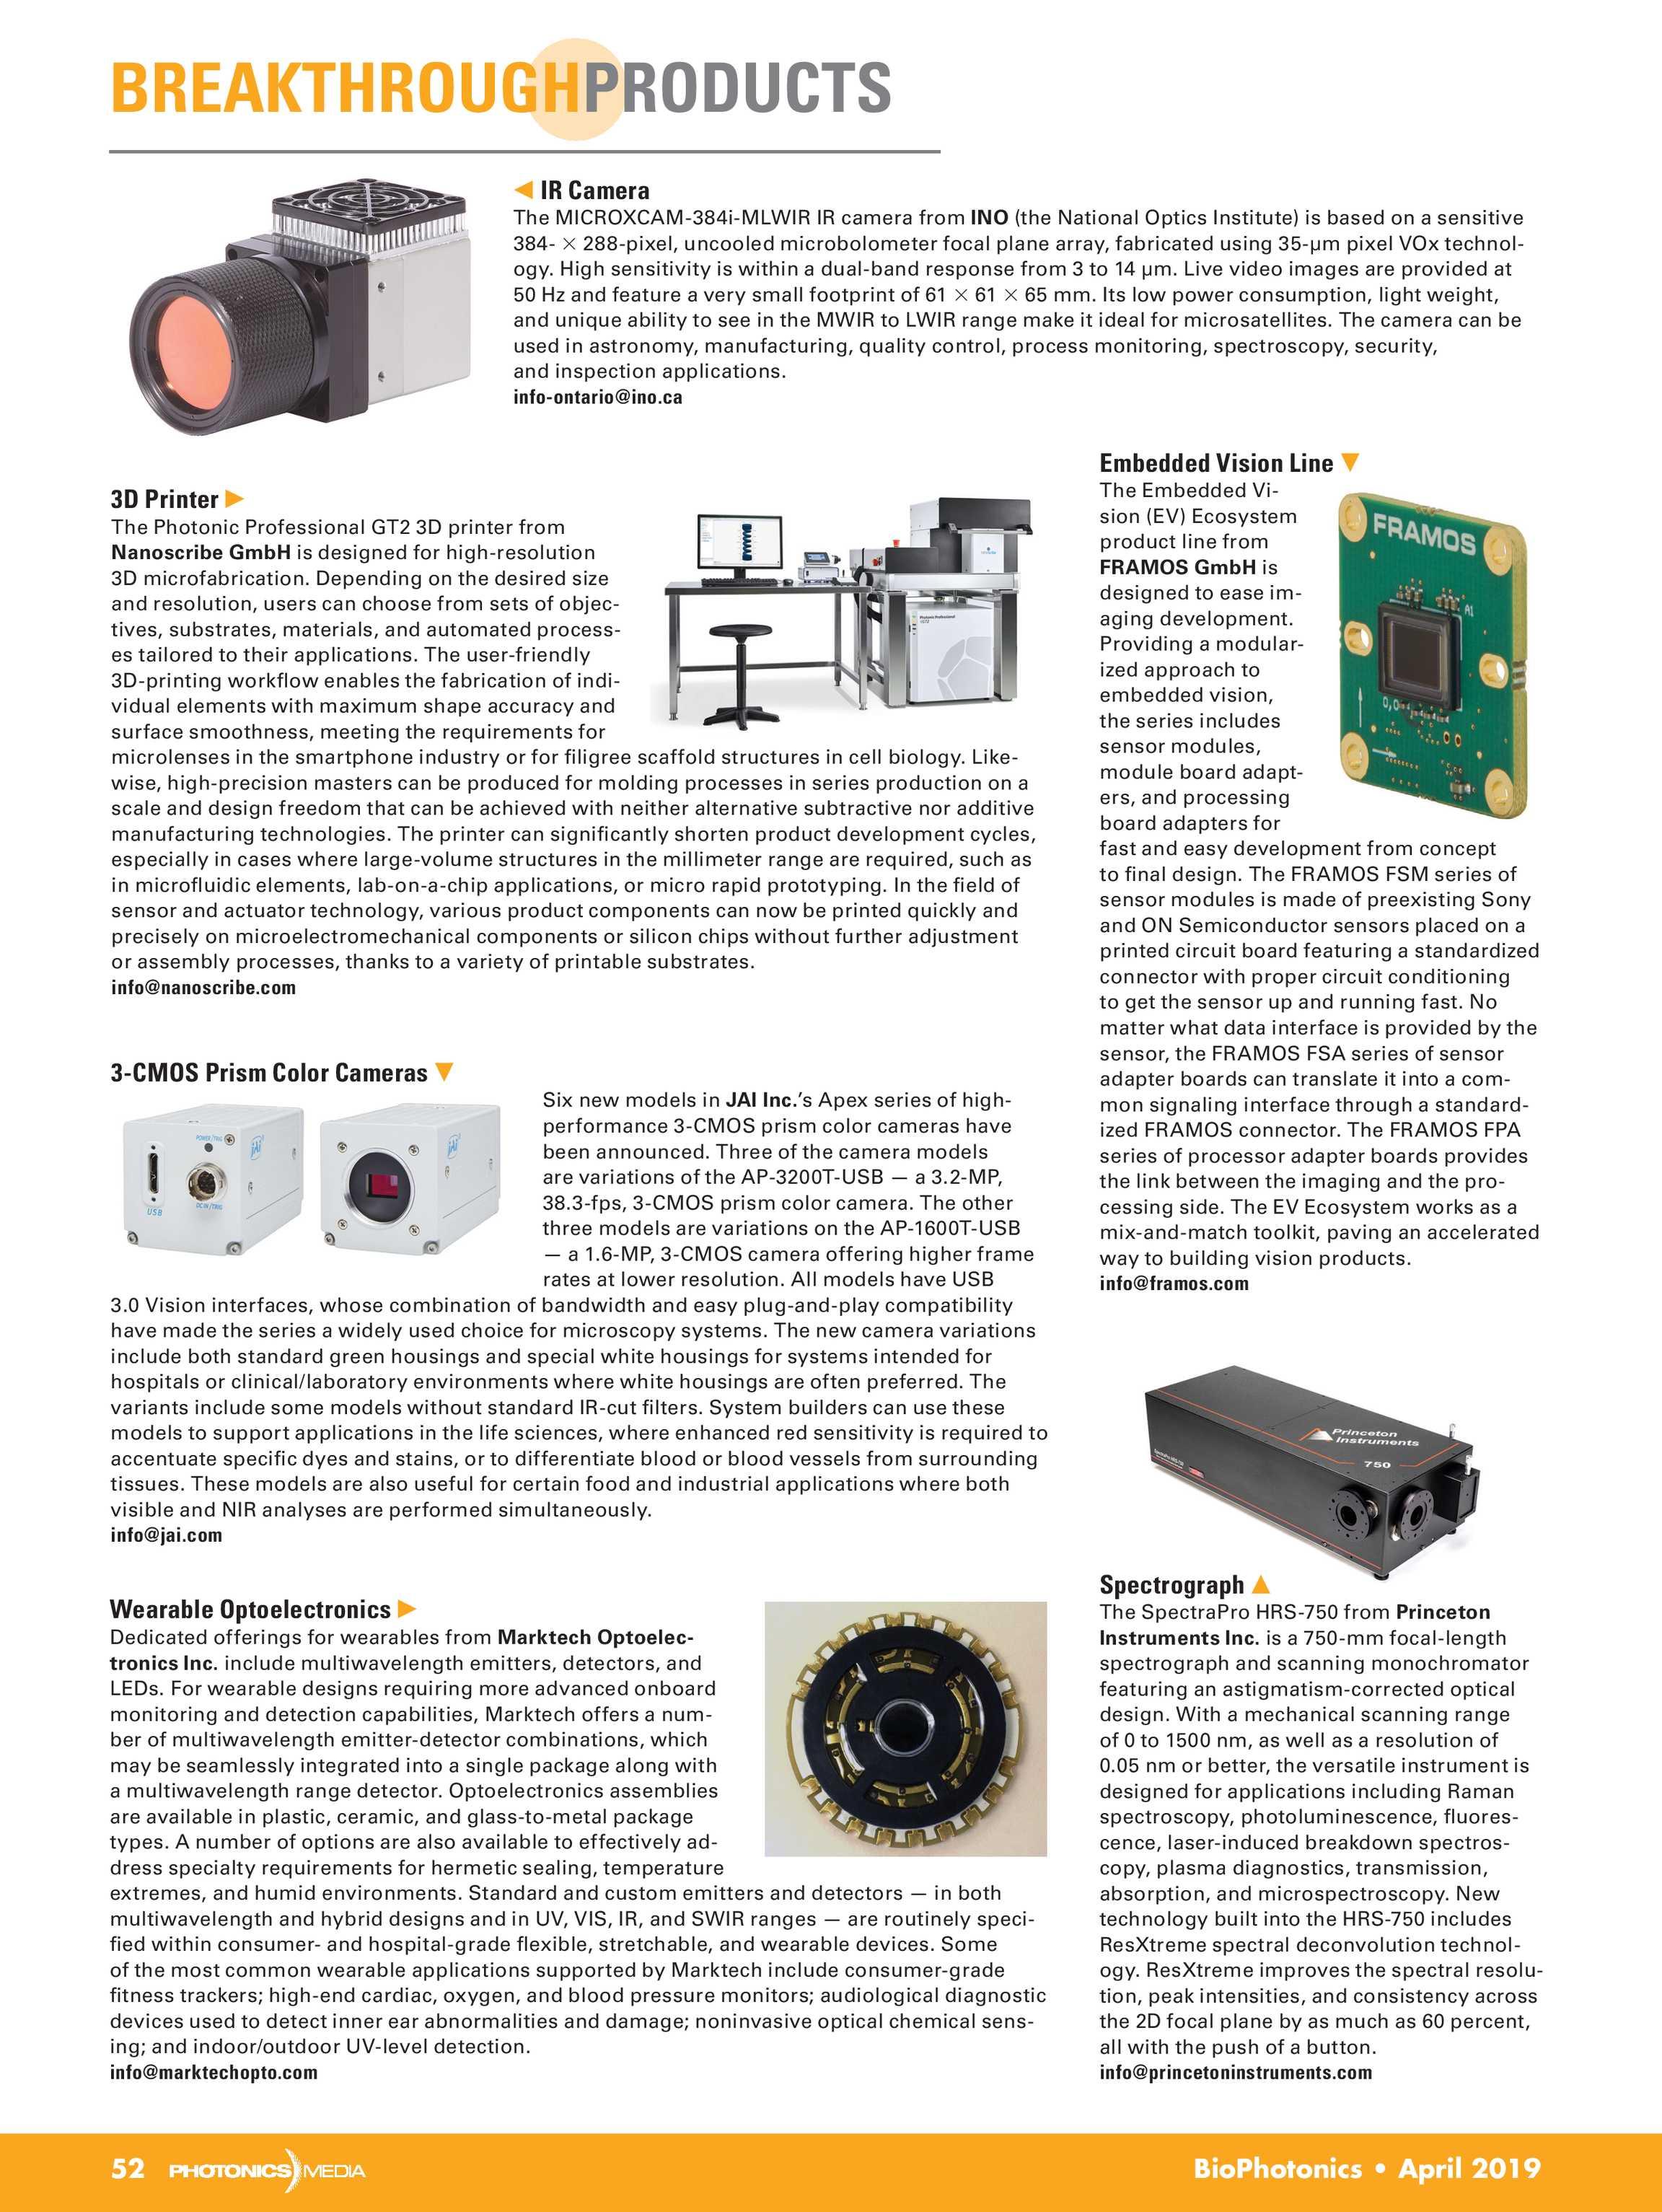 Bio Photonics - April 2019 - page 52